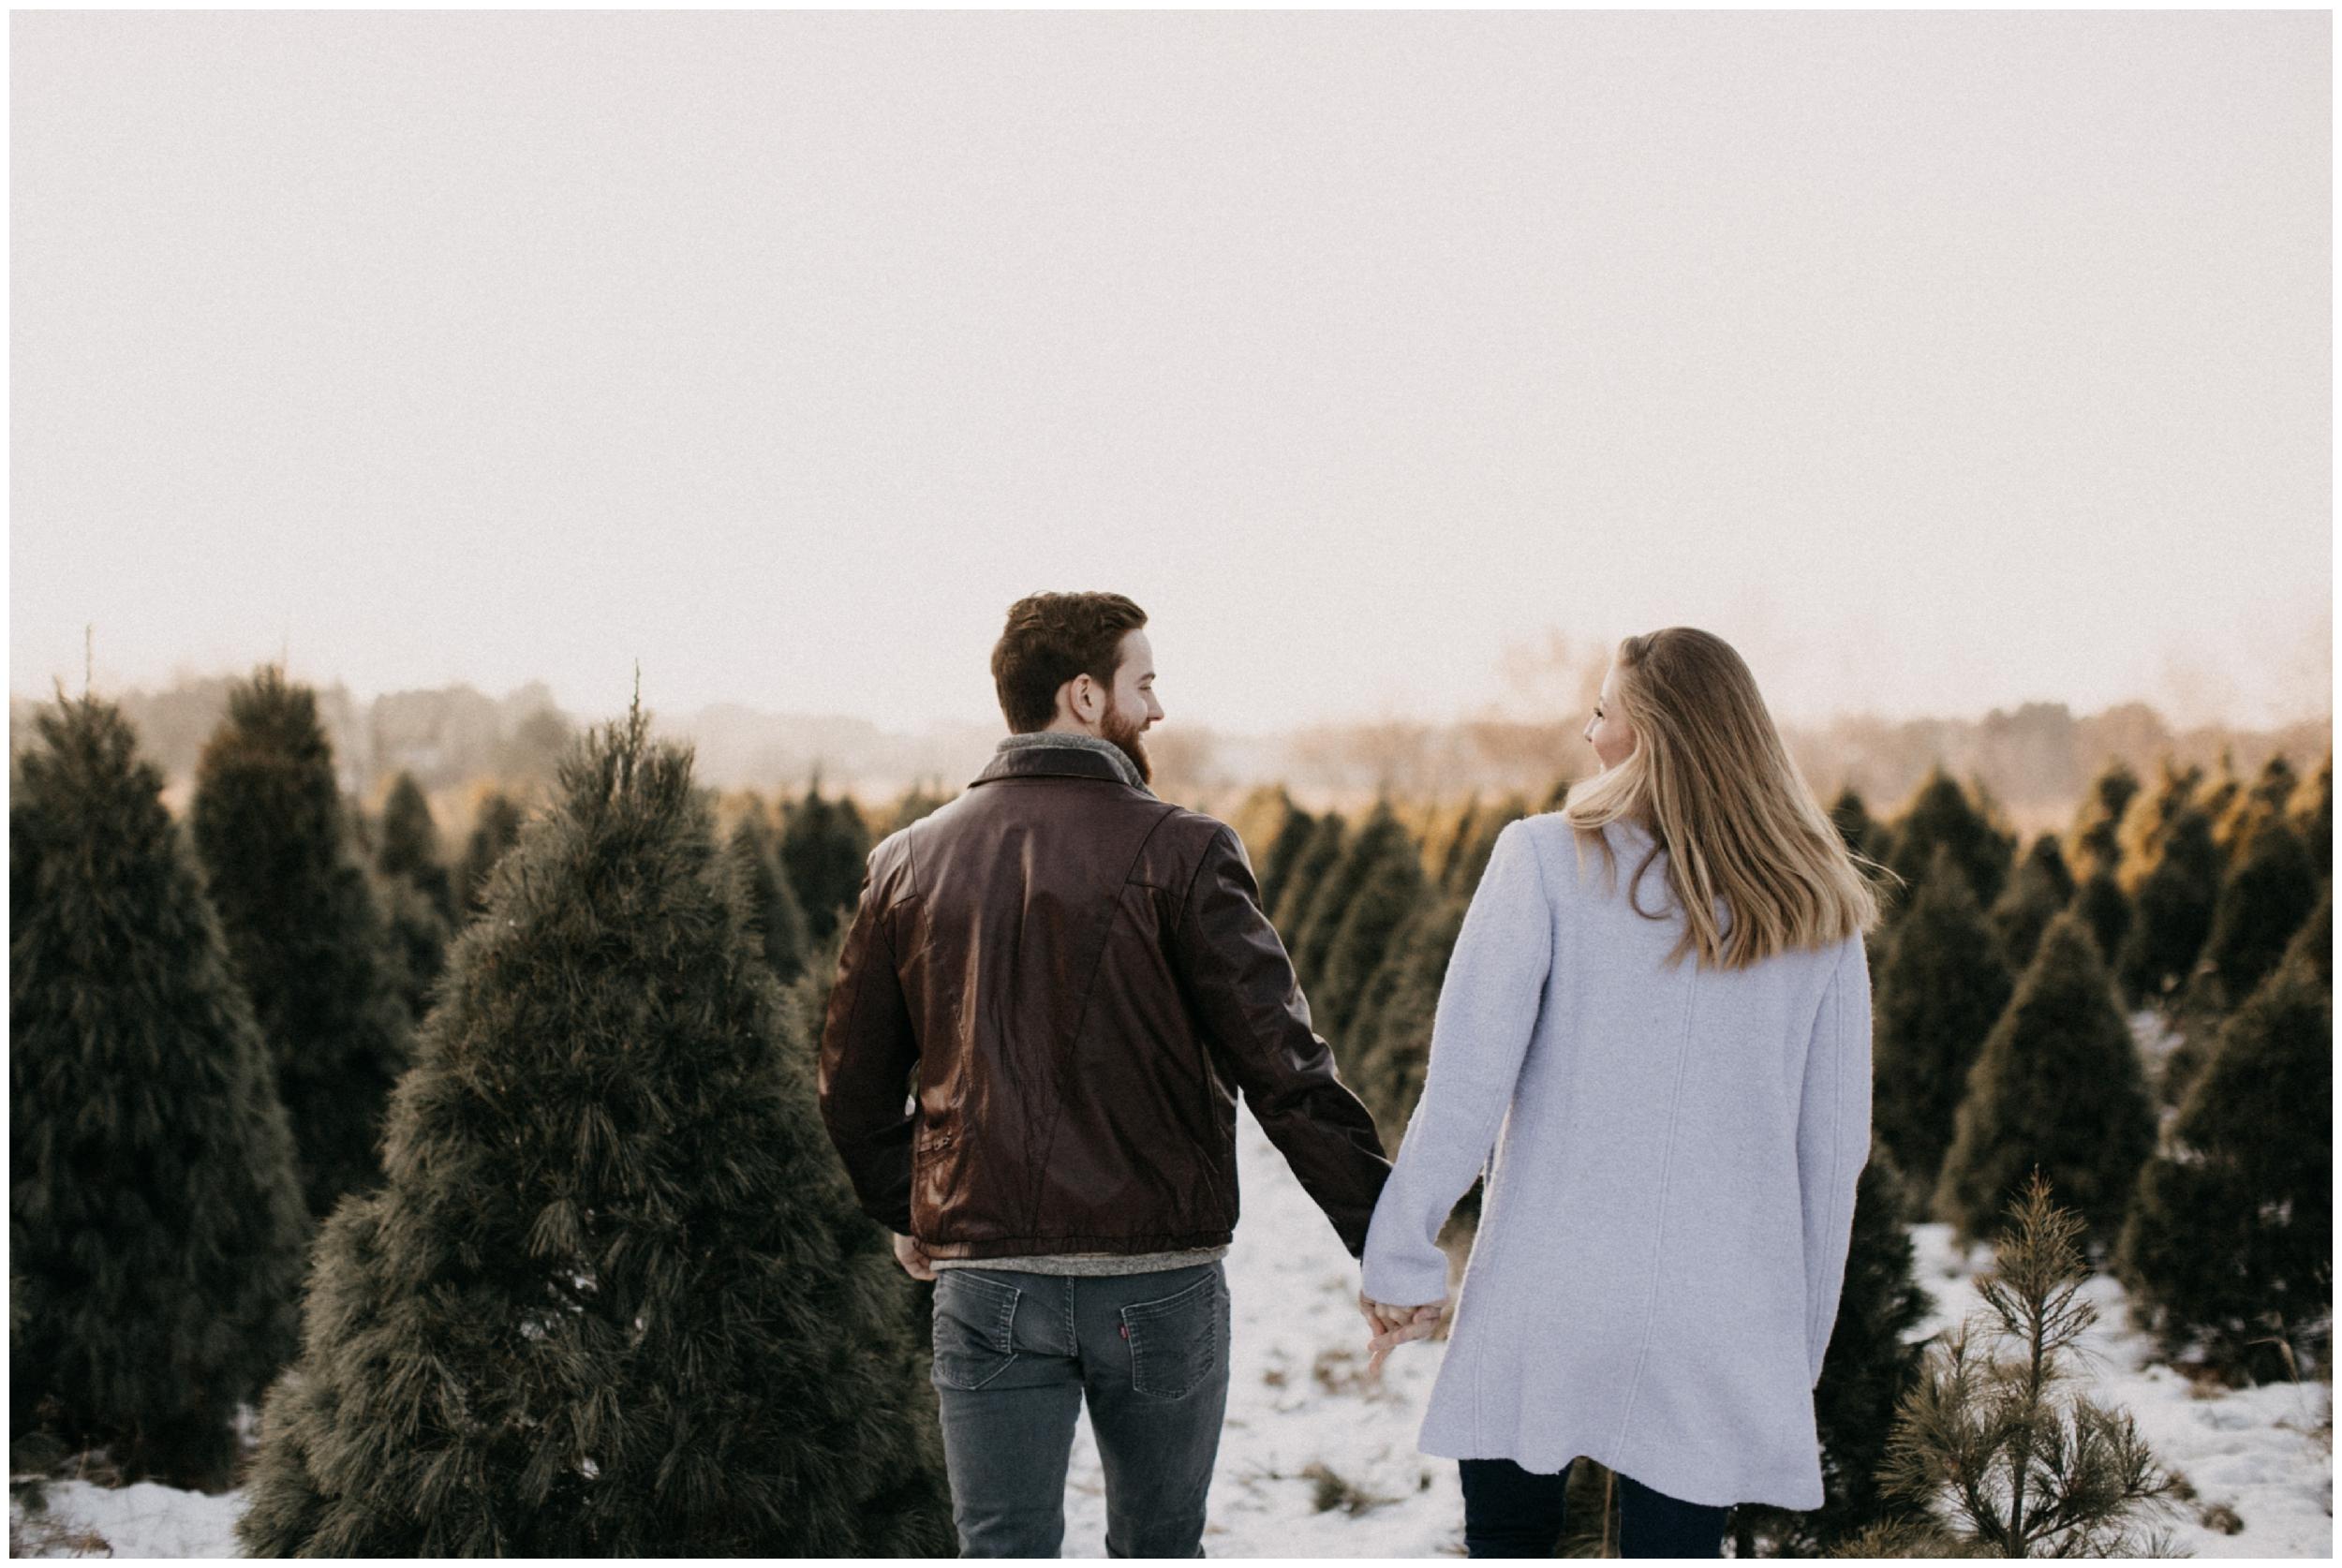 Engagement at Hansen Tree Farm in Anoka, MN